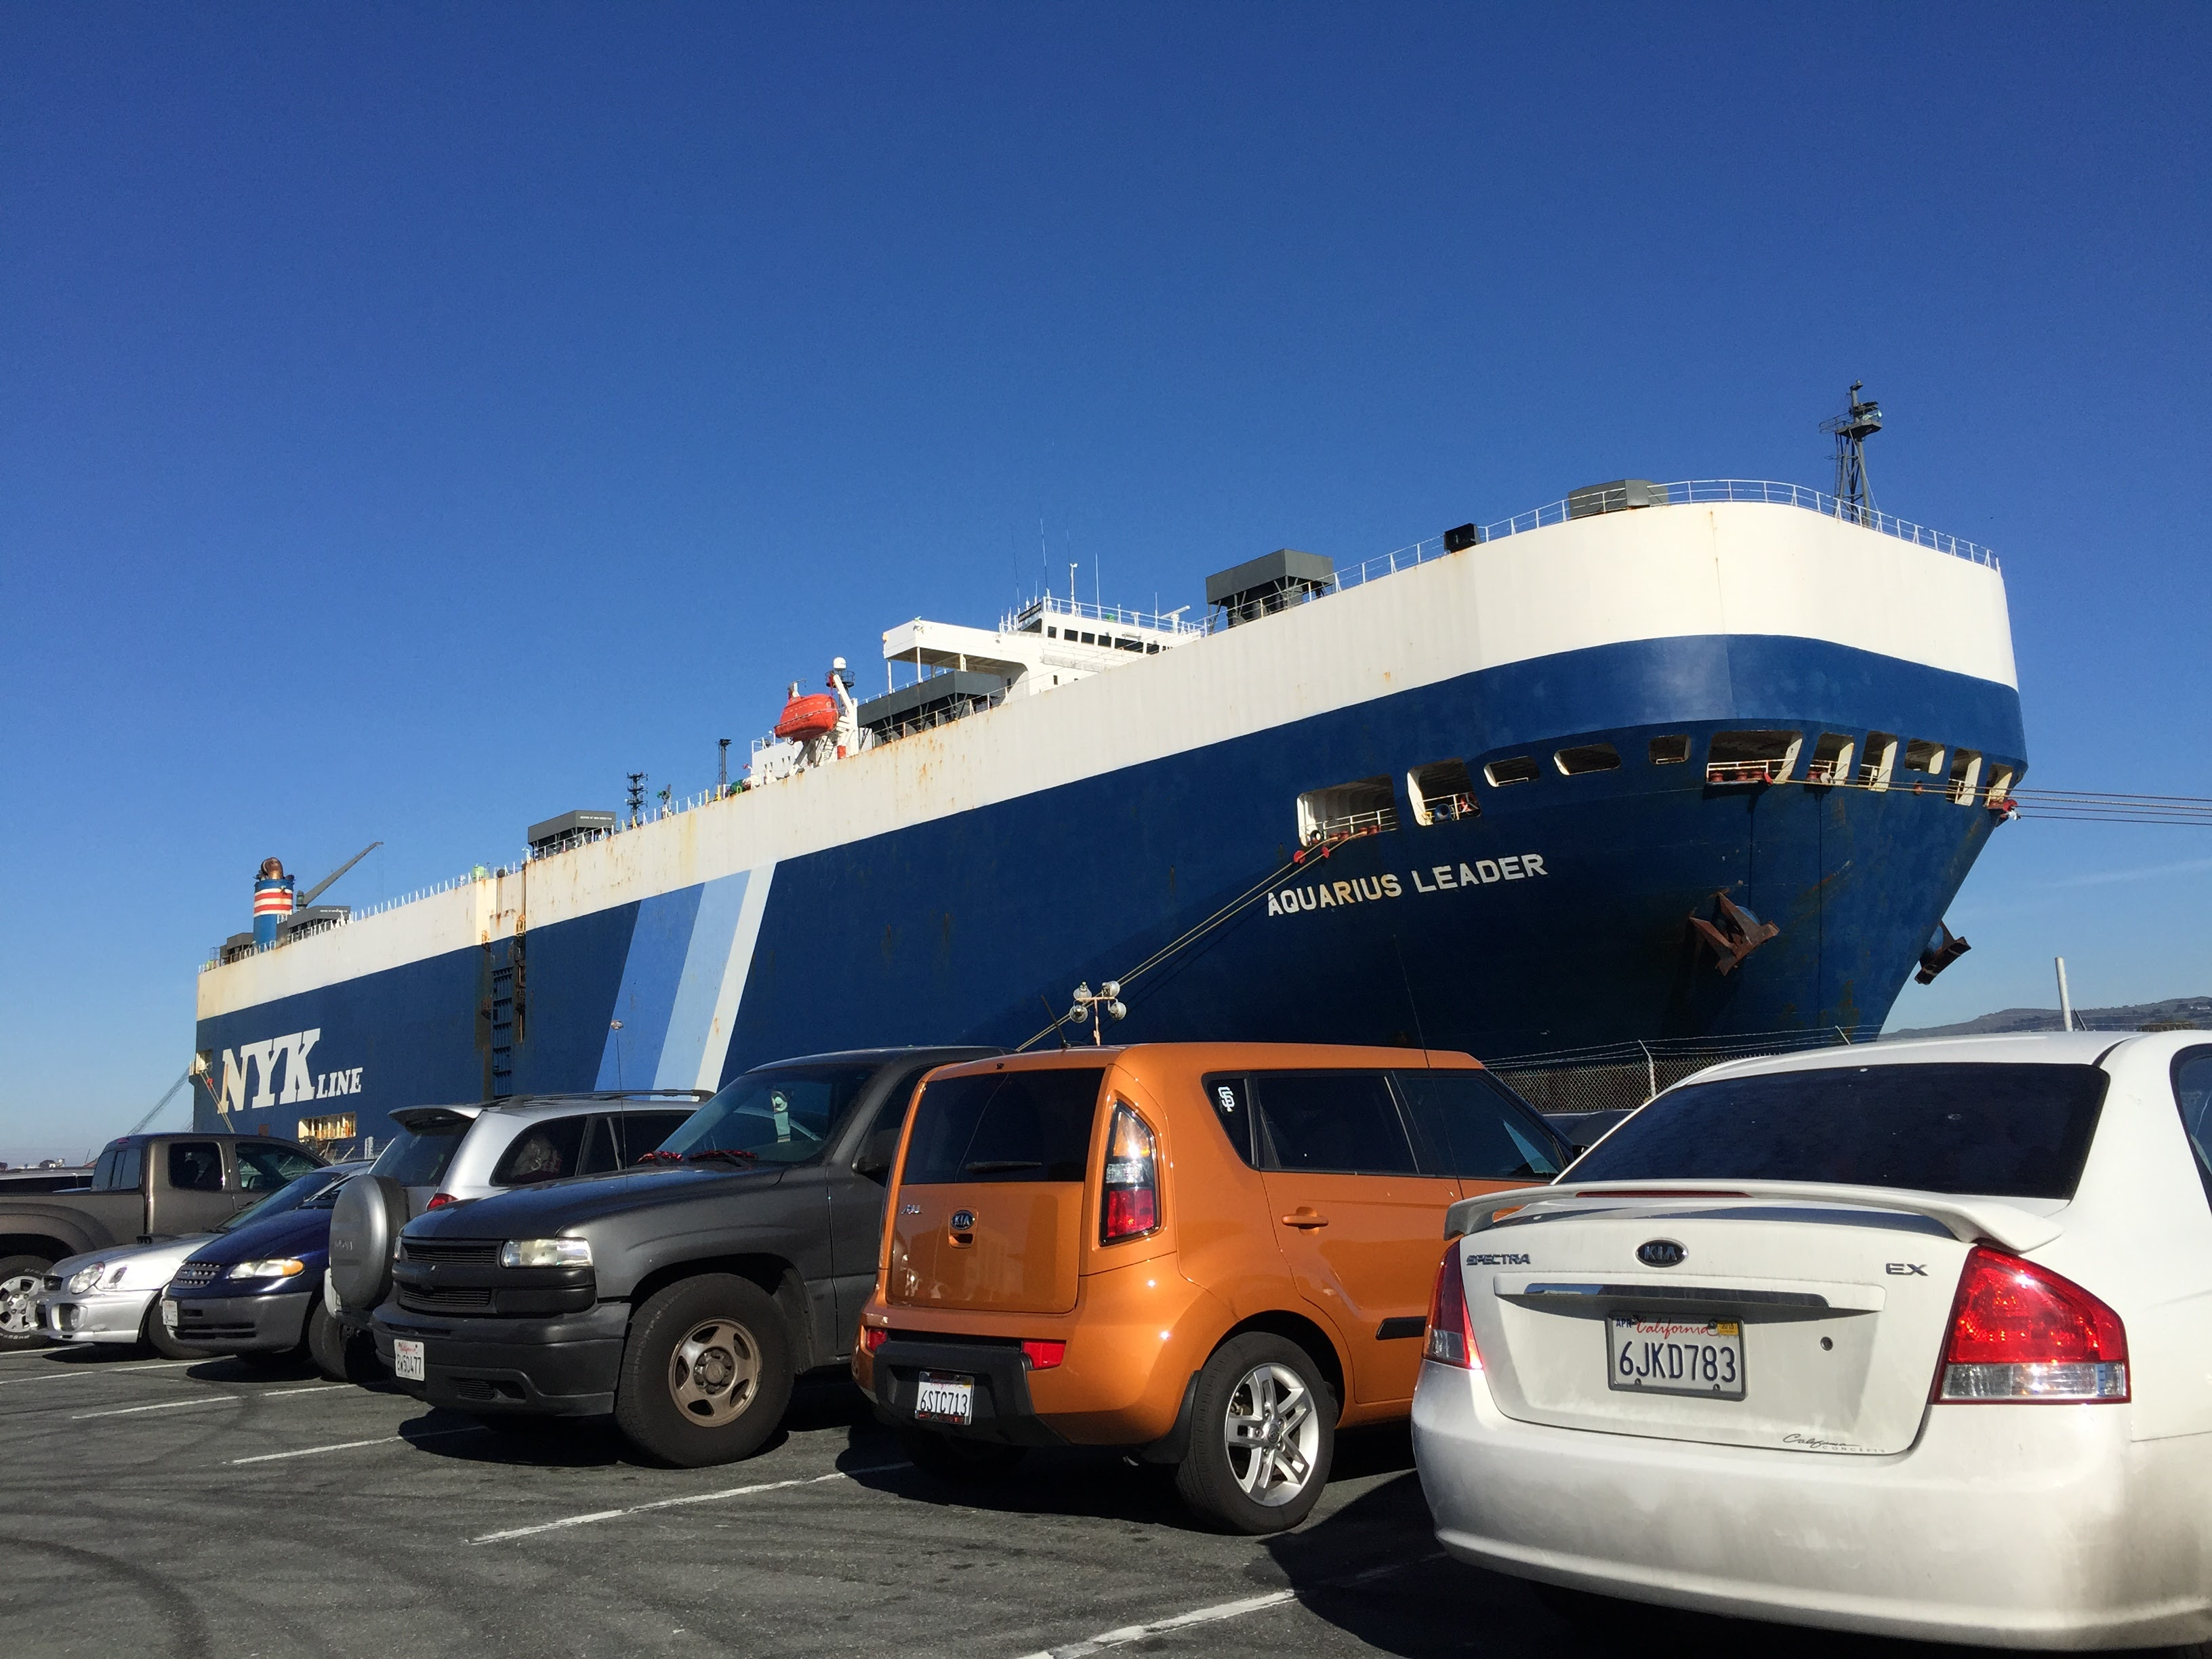 Shipping cars on RoRo ship to South Korea